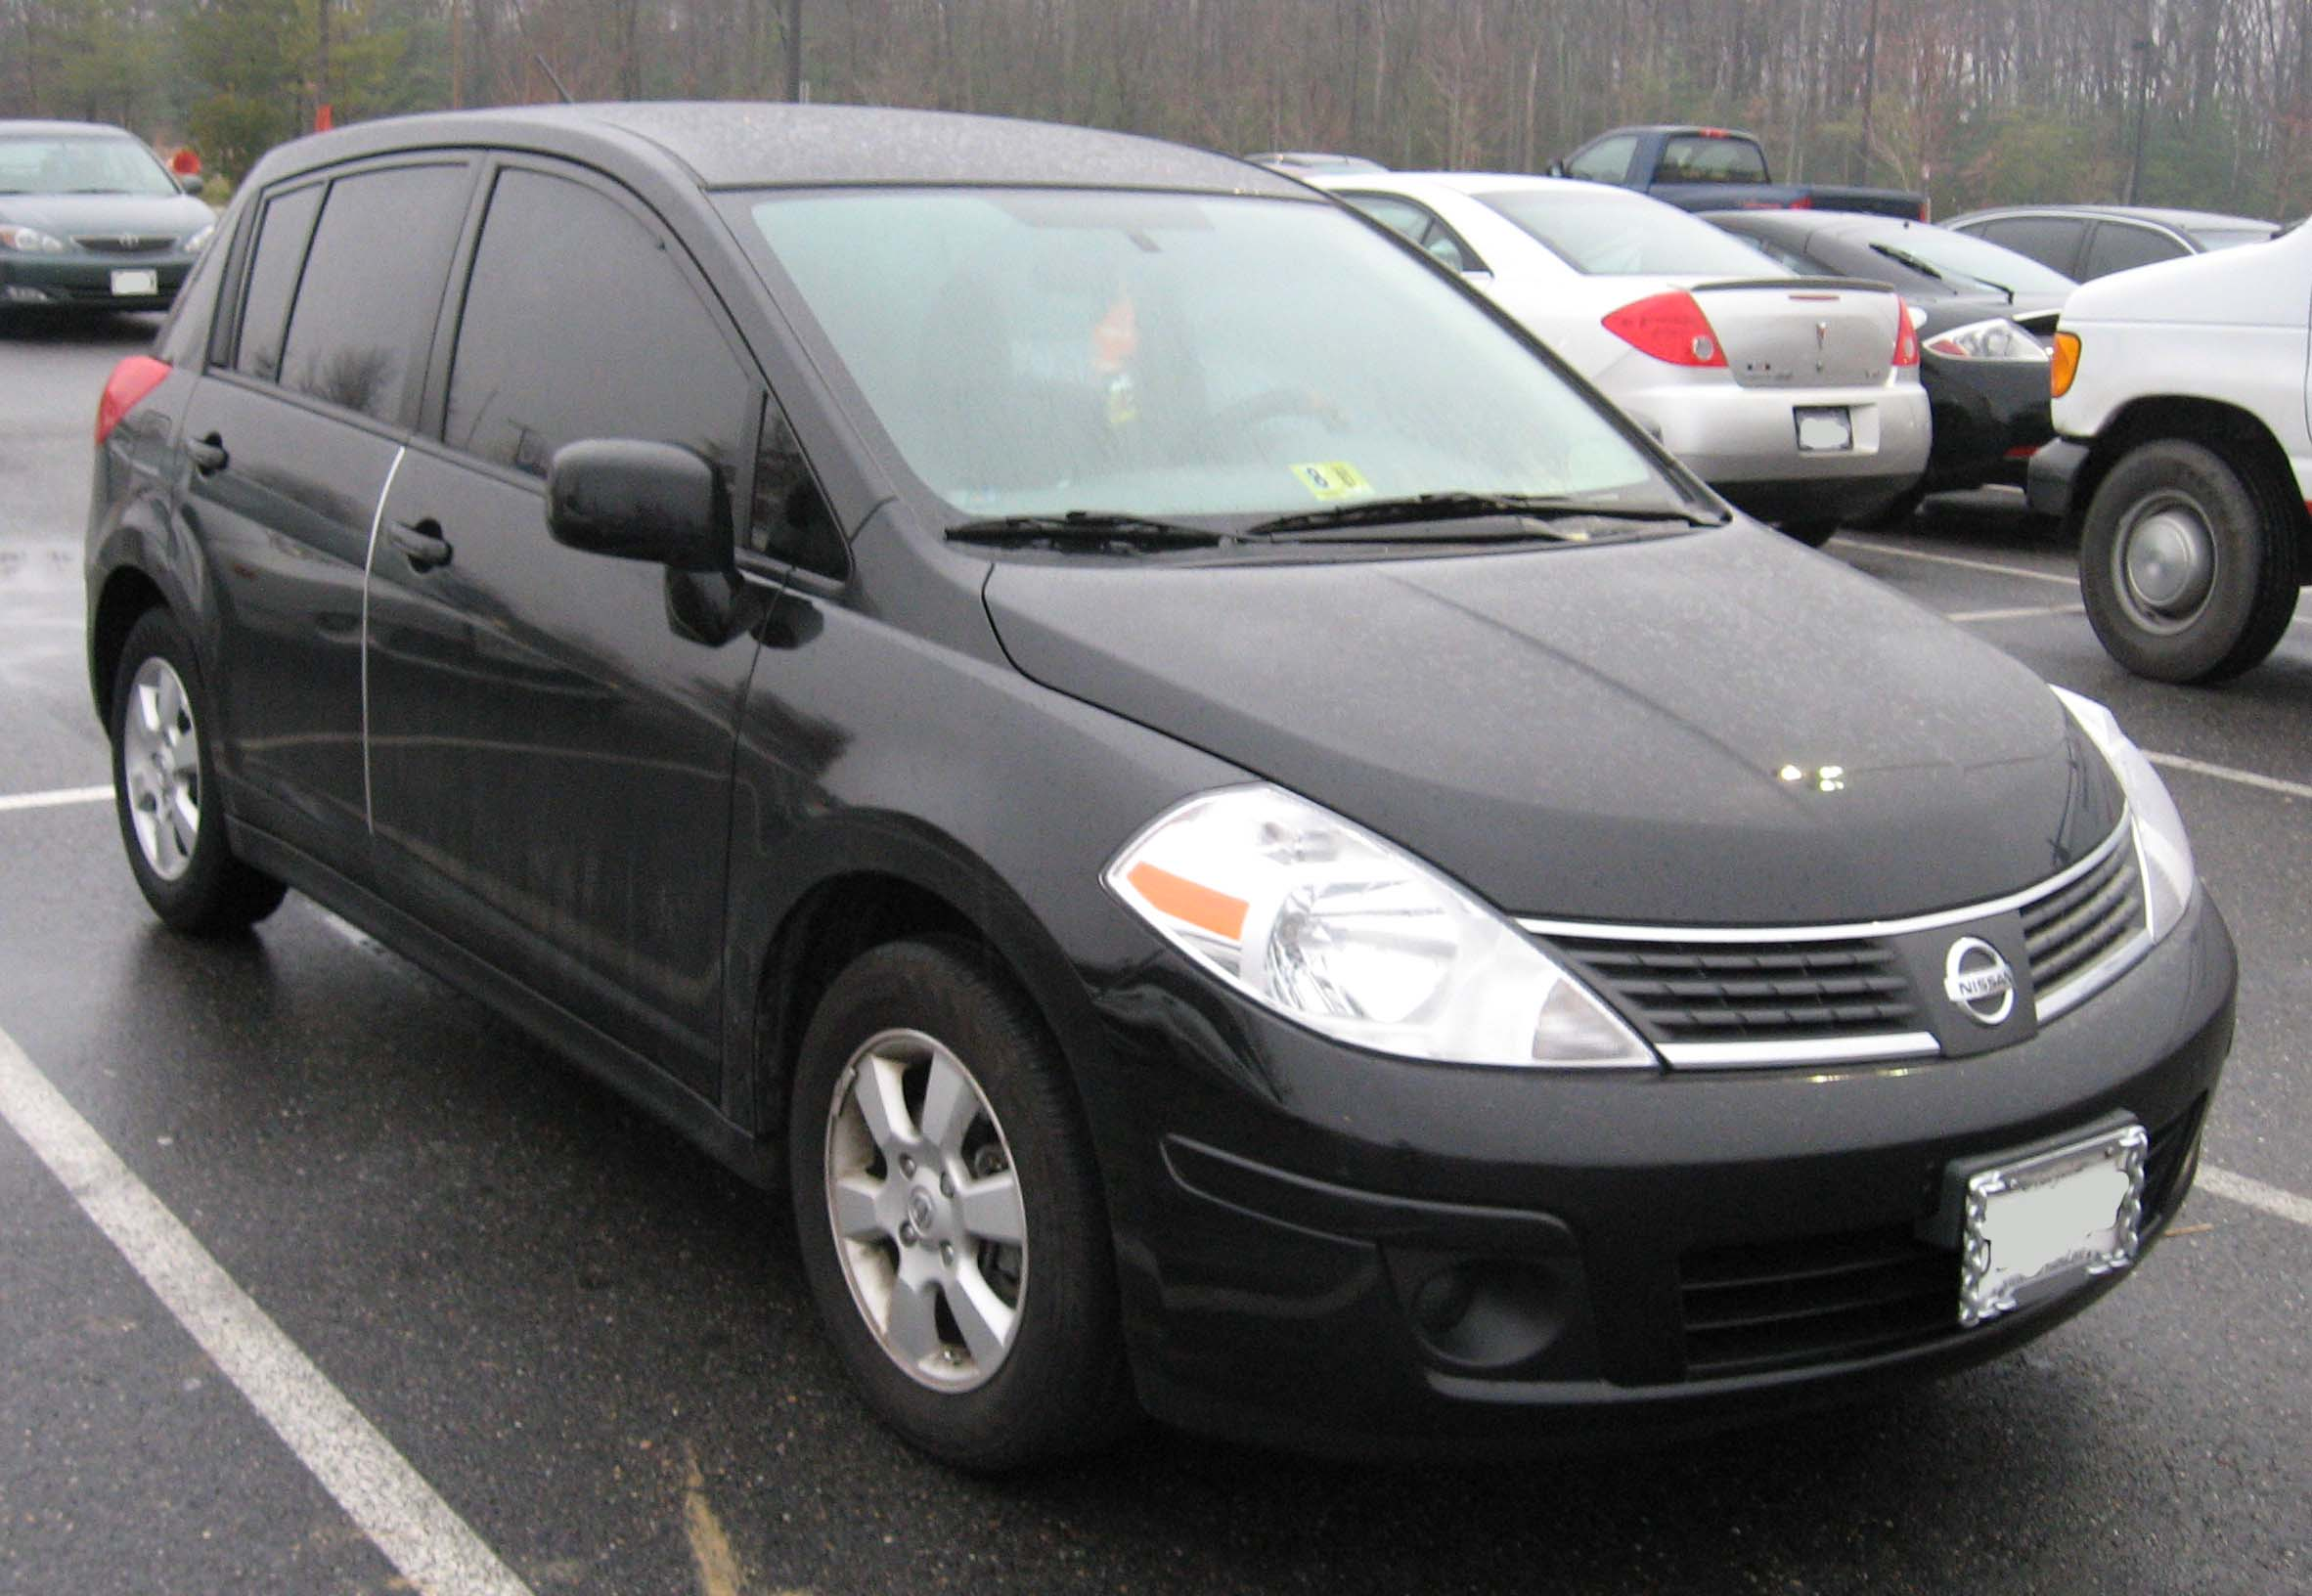 [Image: 2007-Nissan-Versa-hatchback.jpg]